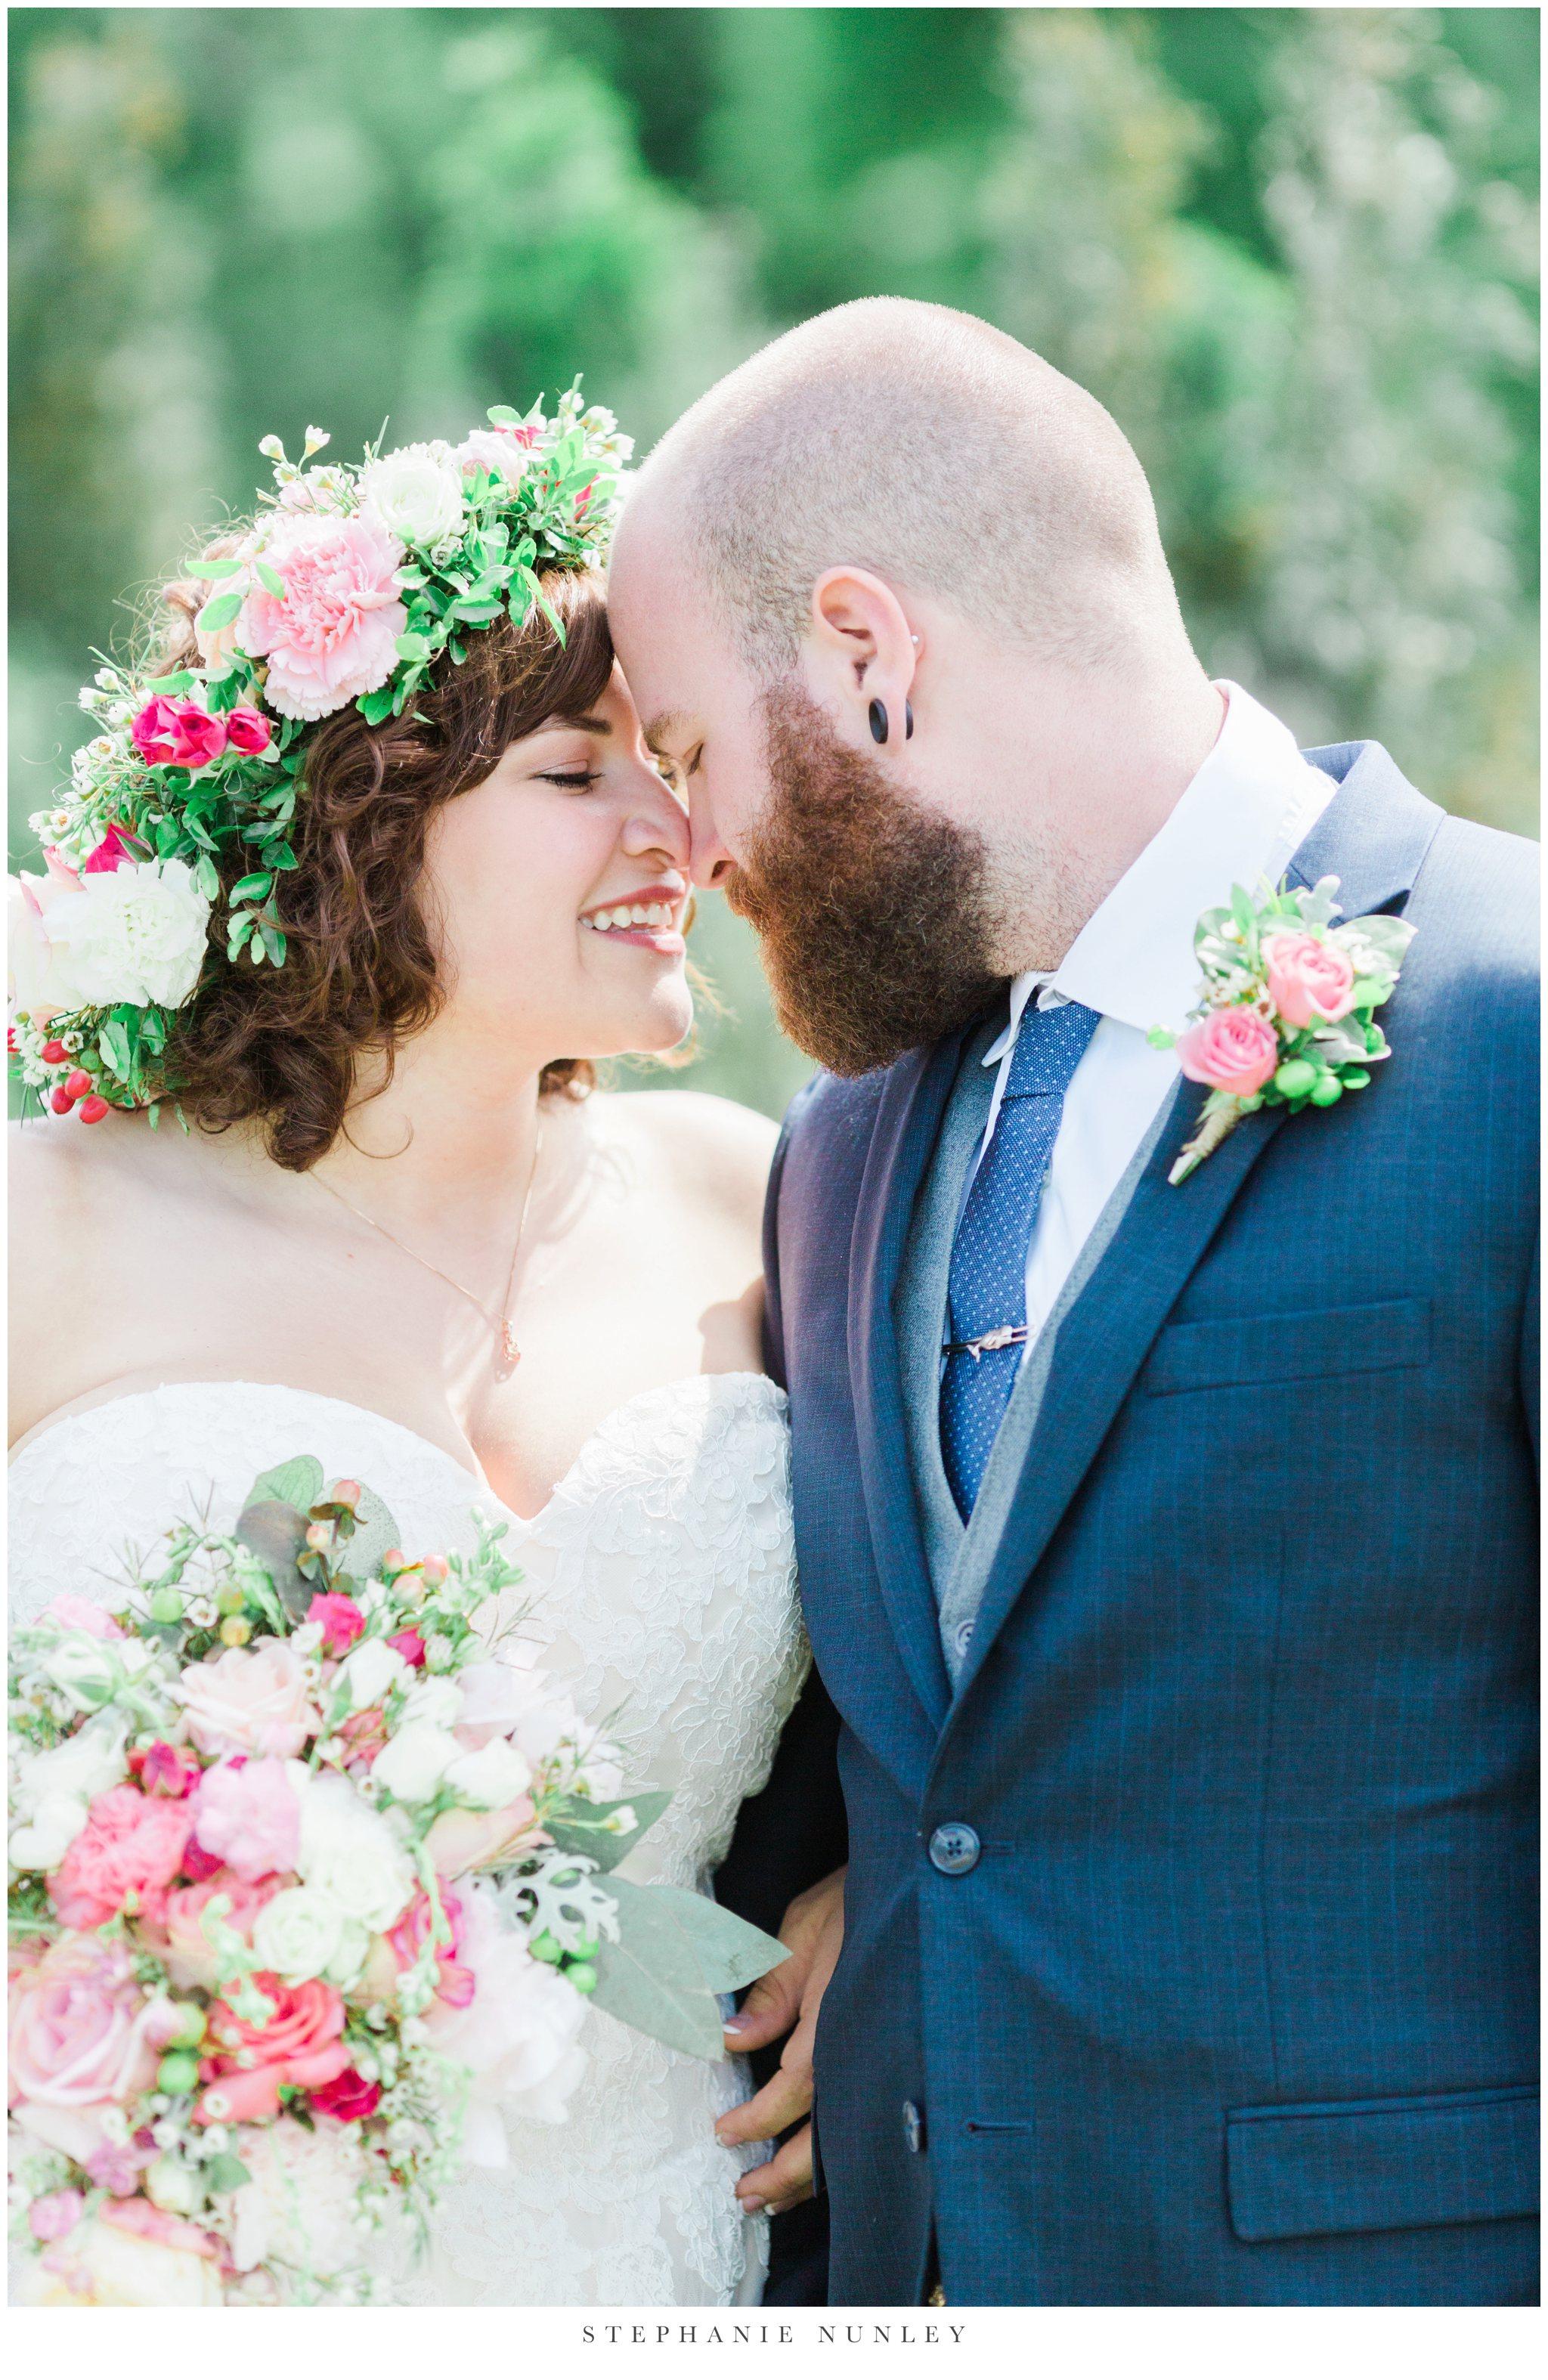 romantic-outdoor-wedding-with-flower-crown-0067.jpg